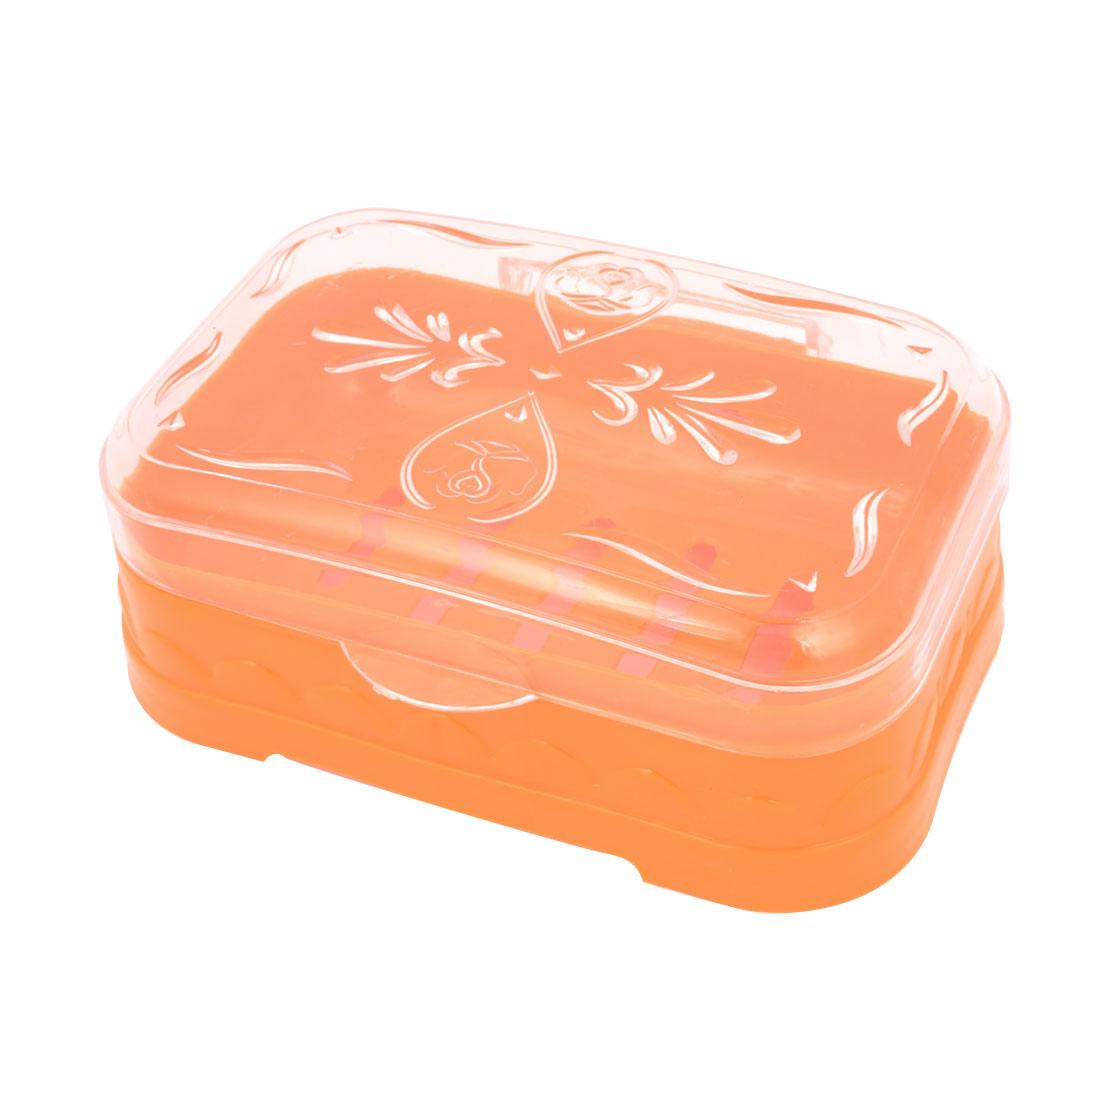 Bathroom Perforating Bottom Plastic Soap Box Case Holder Orange Clear